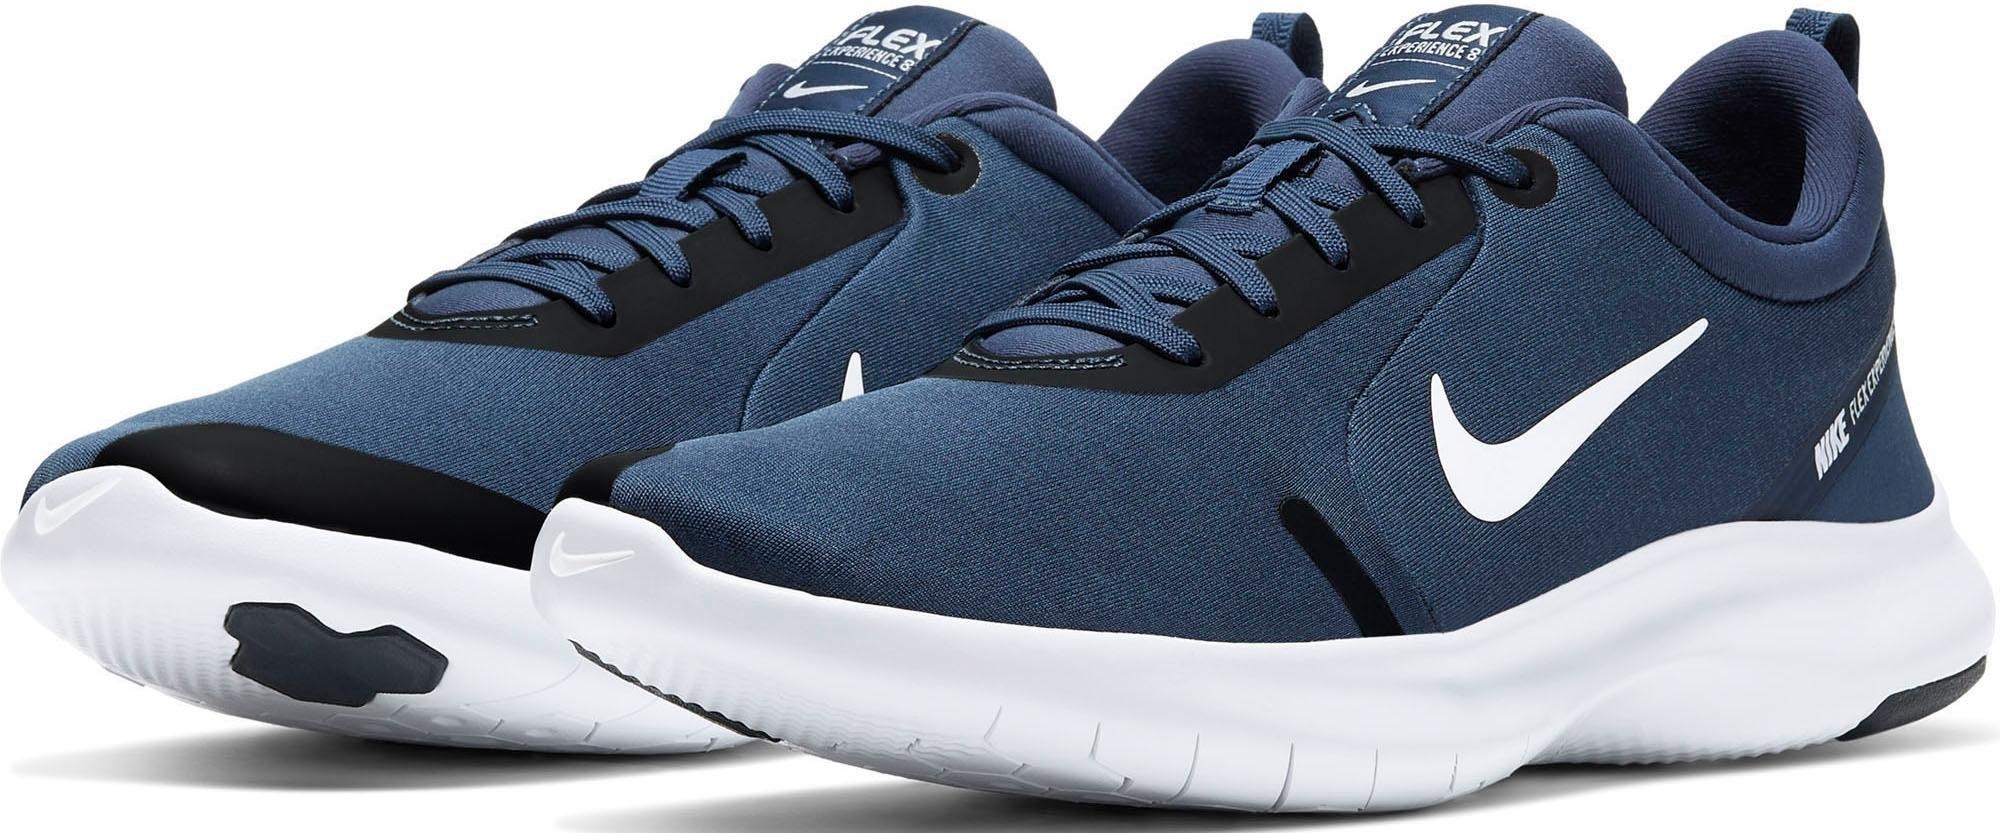 Nike runningschoenen »Flex Experience Run 8« goedkoop op otto.nl kopen